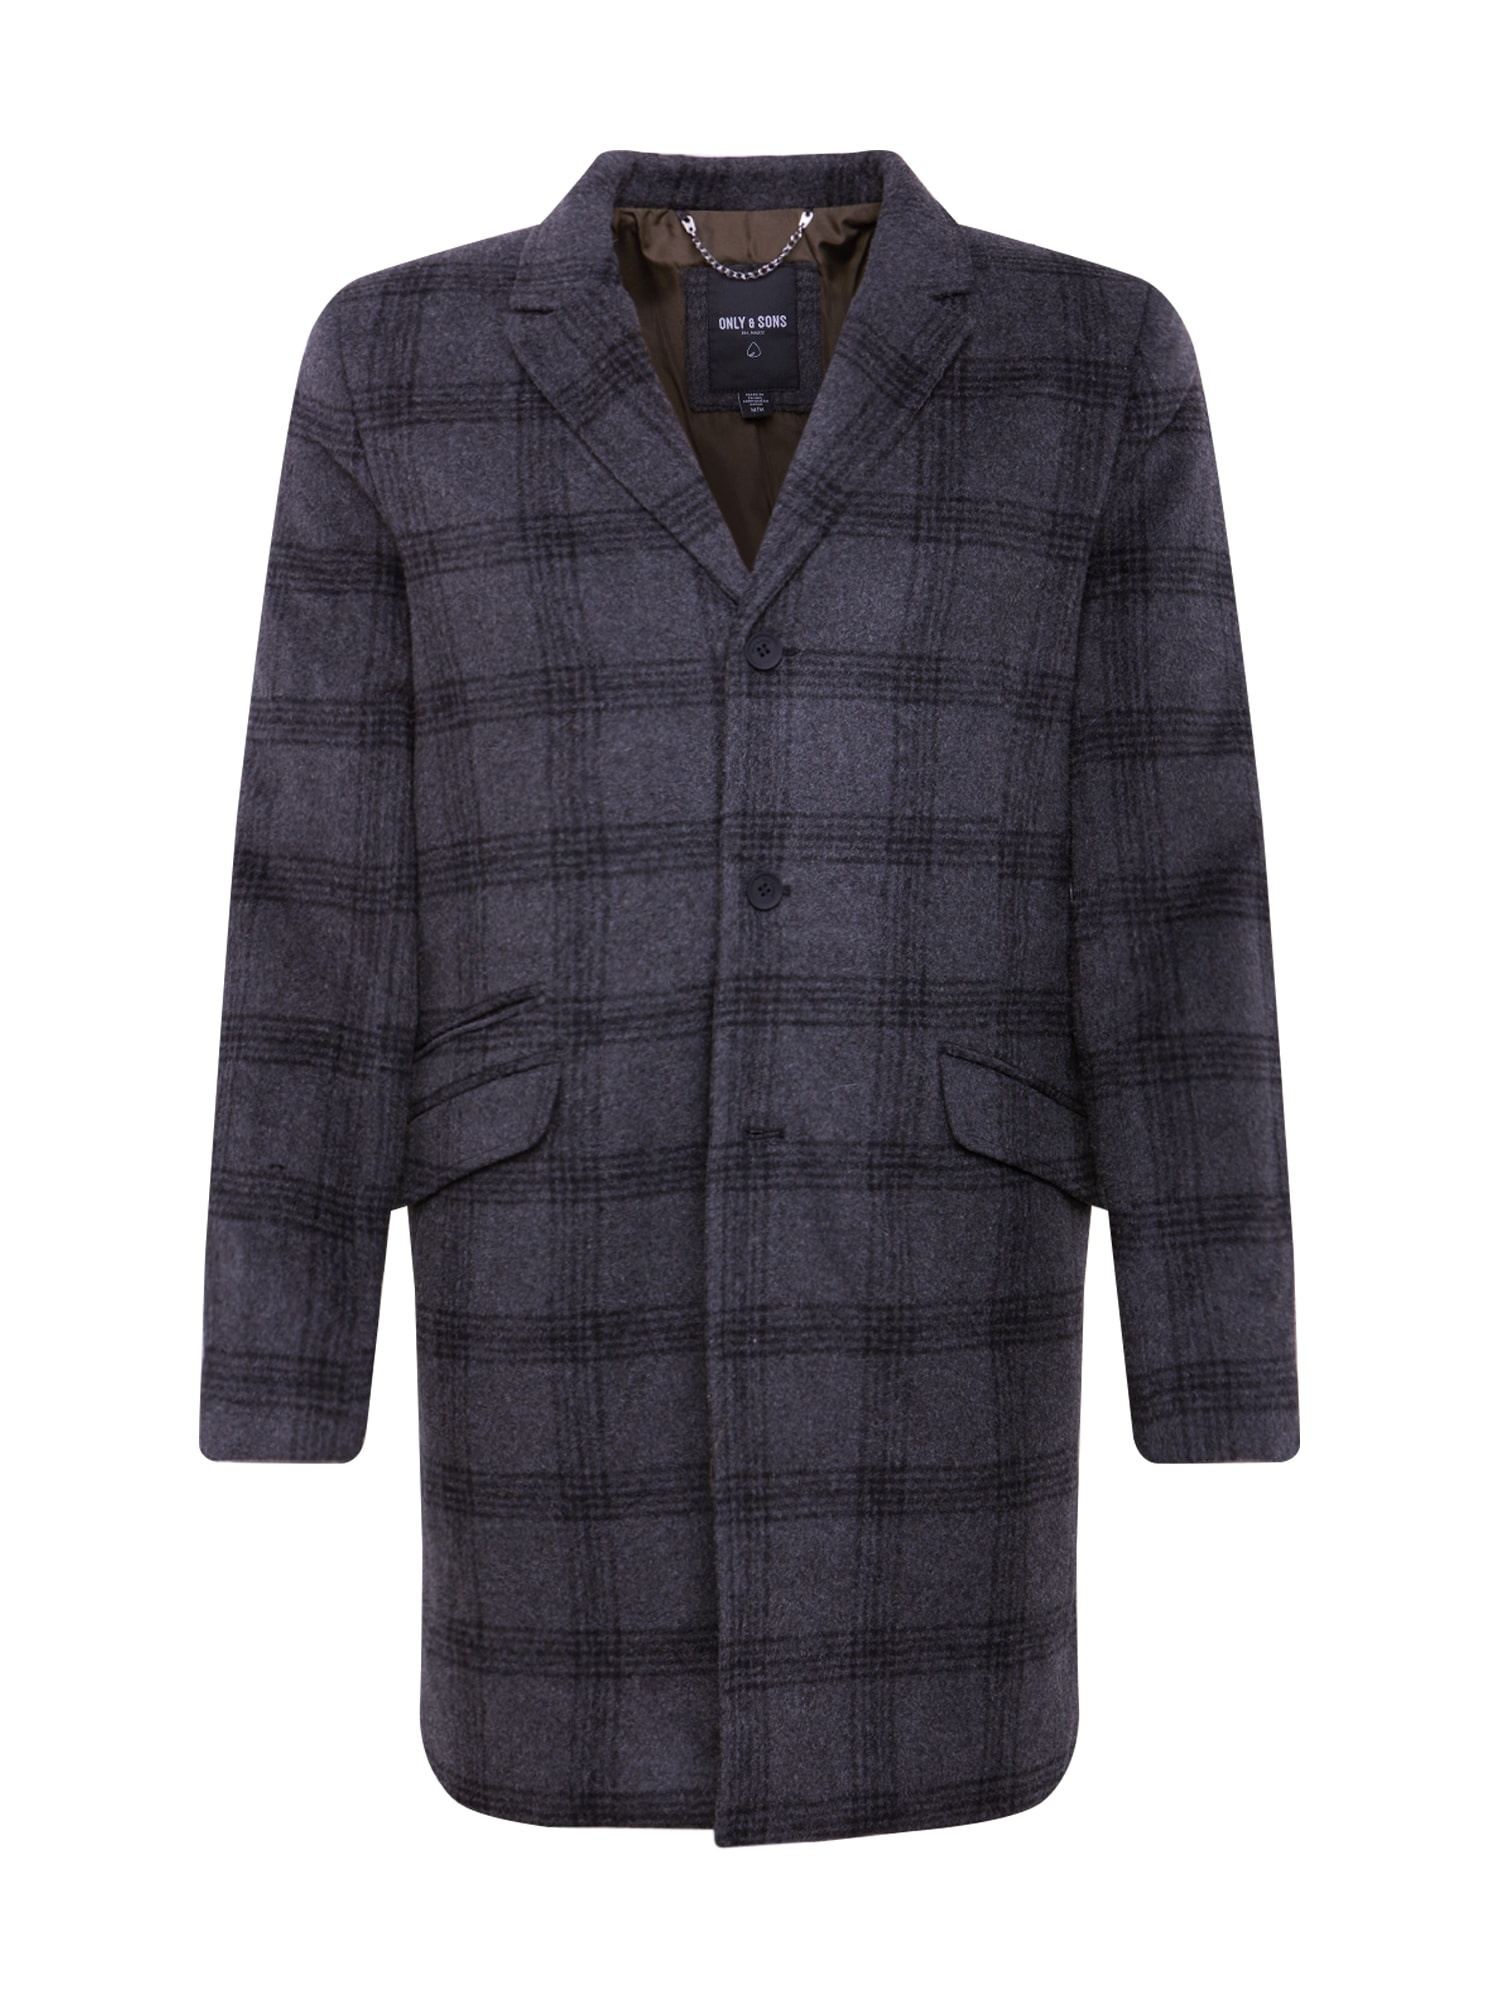 Only & Sons Rudeninis-žieminis paltas 'JULIAN' tamsiai pilka